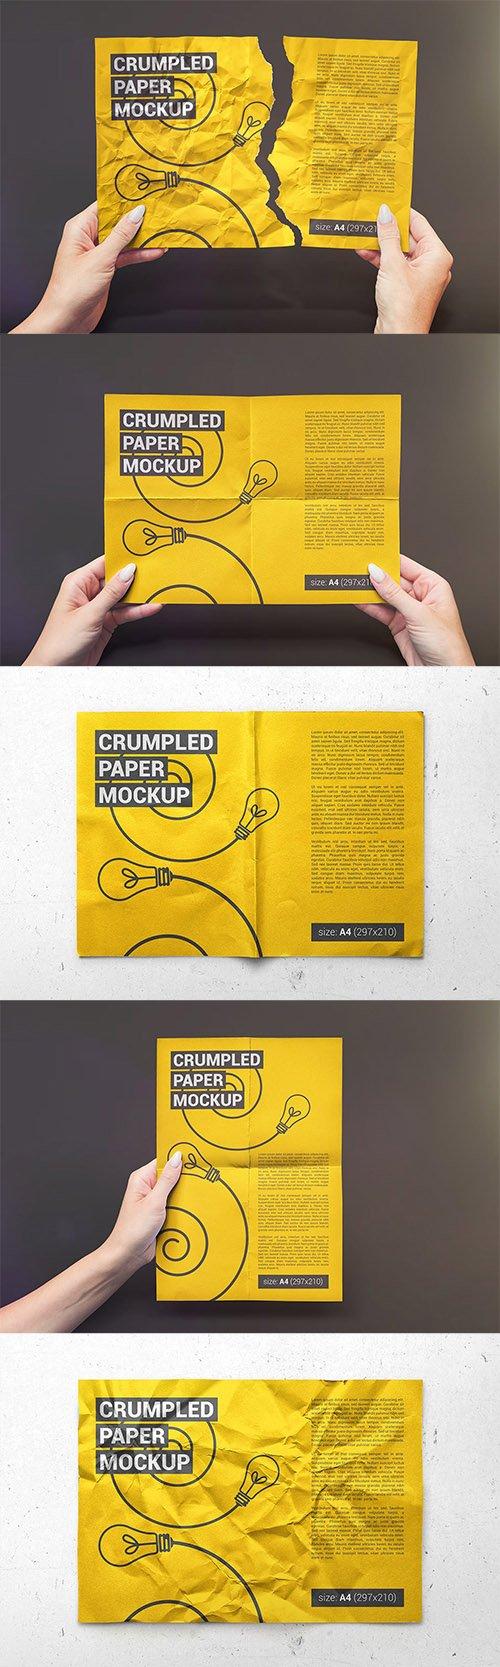 Crumpled A4 Paper / Poster / Flyer Mockup